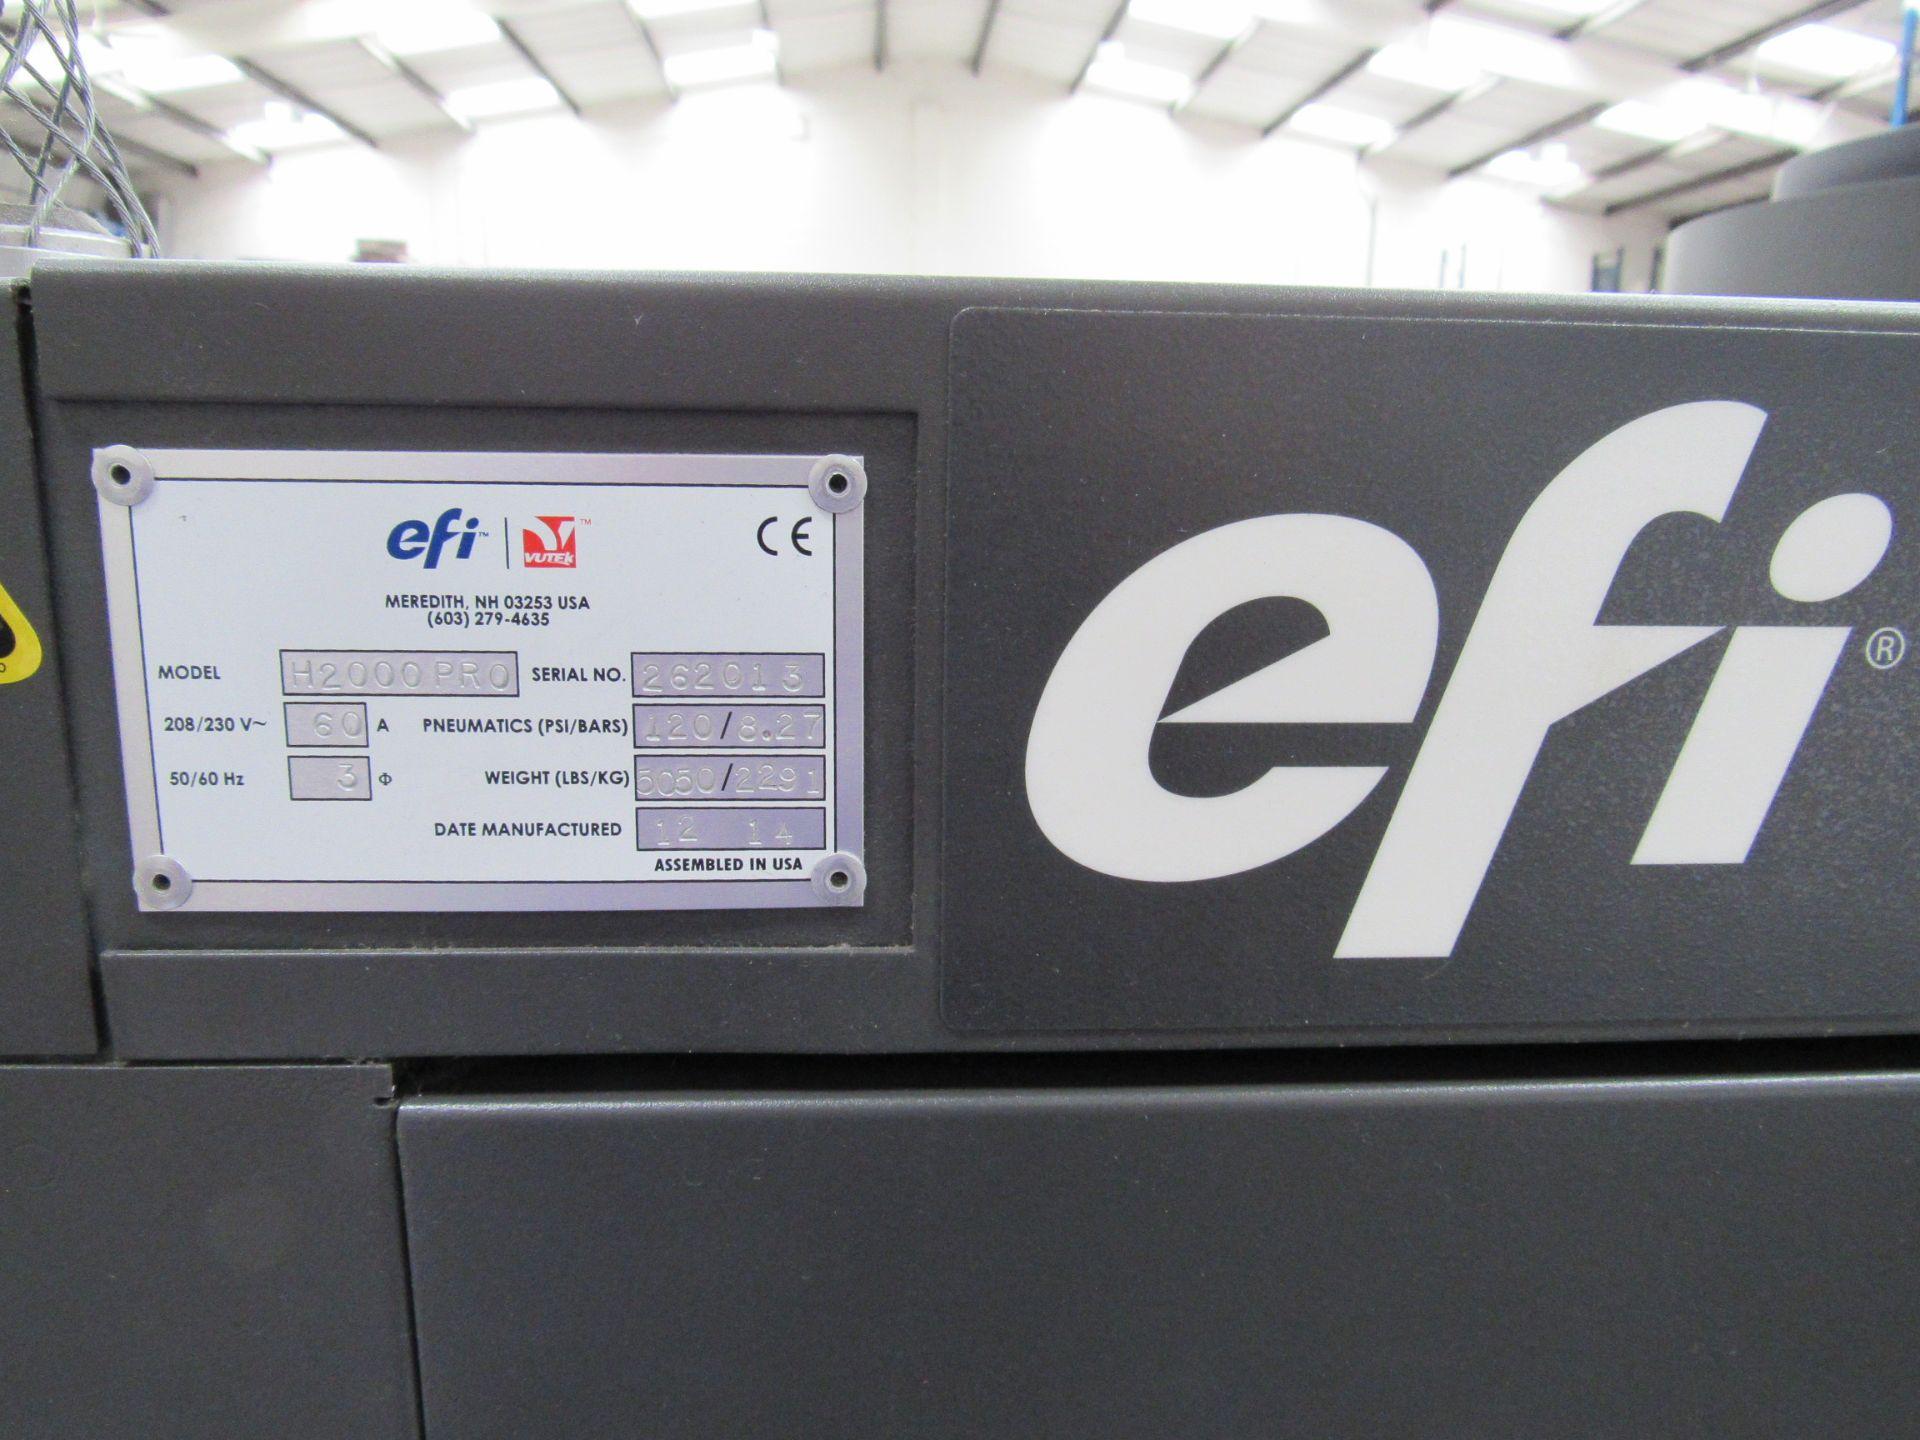 EFI VUTEk H2000 Pro - UltraDrop Technology UV 2m Hybrid Printer, Serial Number 262013, Dec 2014, - Image 5 of 16